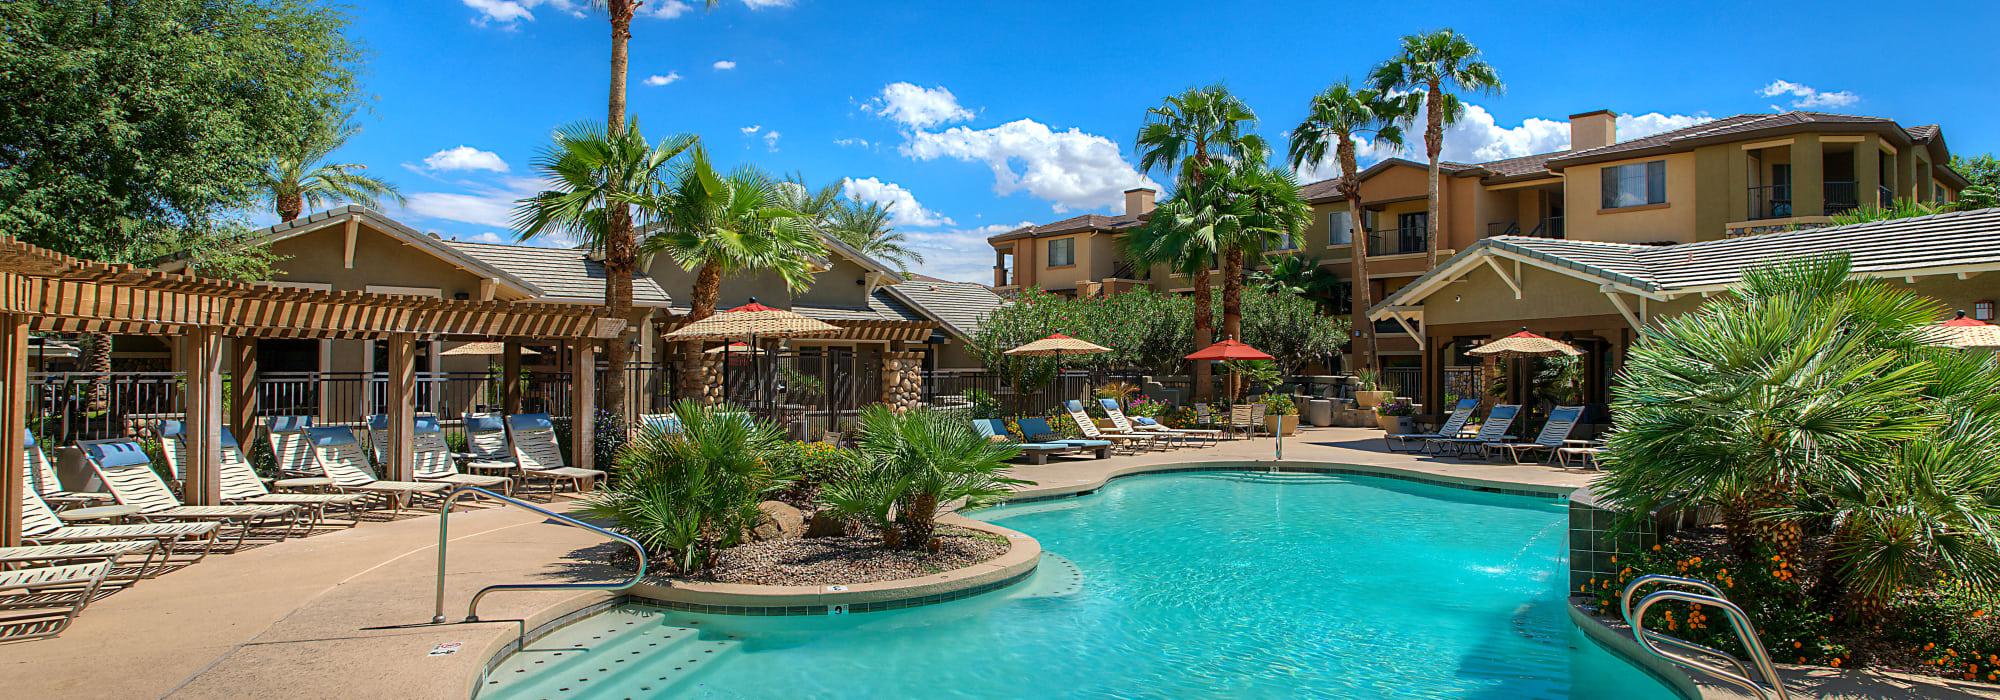 Gorgeous resort swimming pool to Azul at Spectrum in Gilbert, Arizona